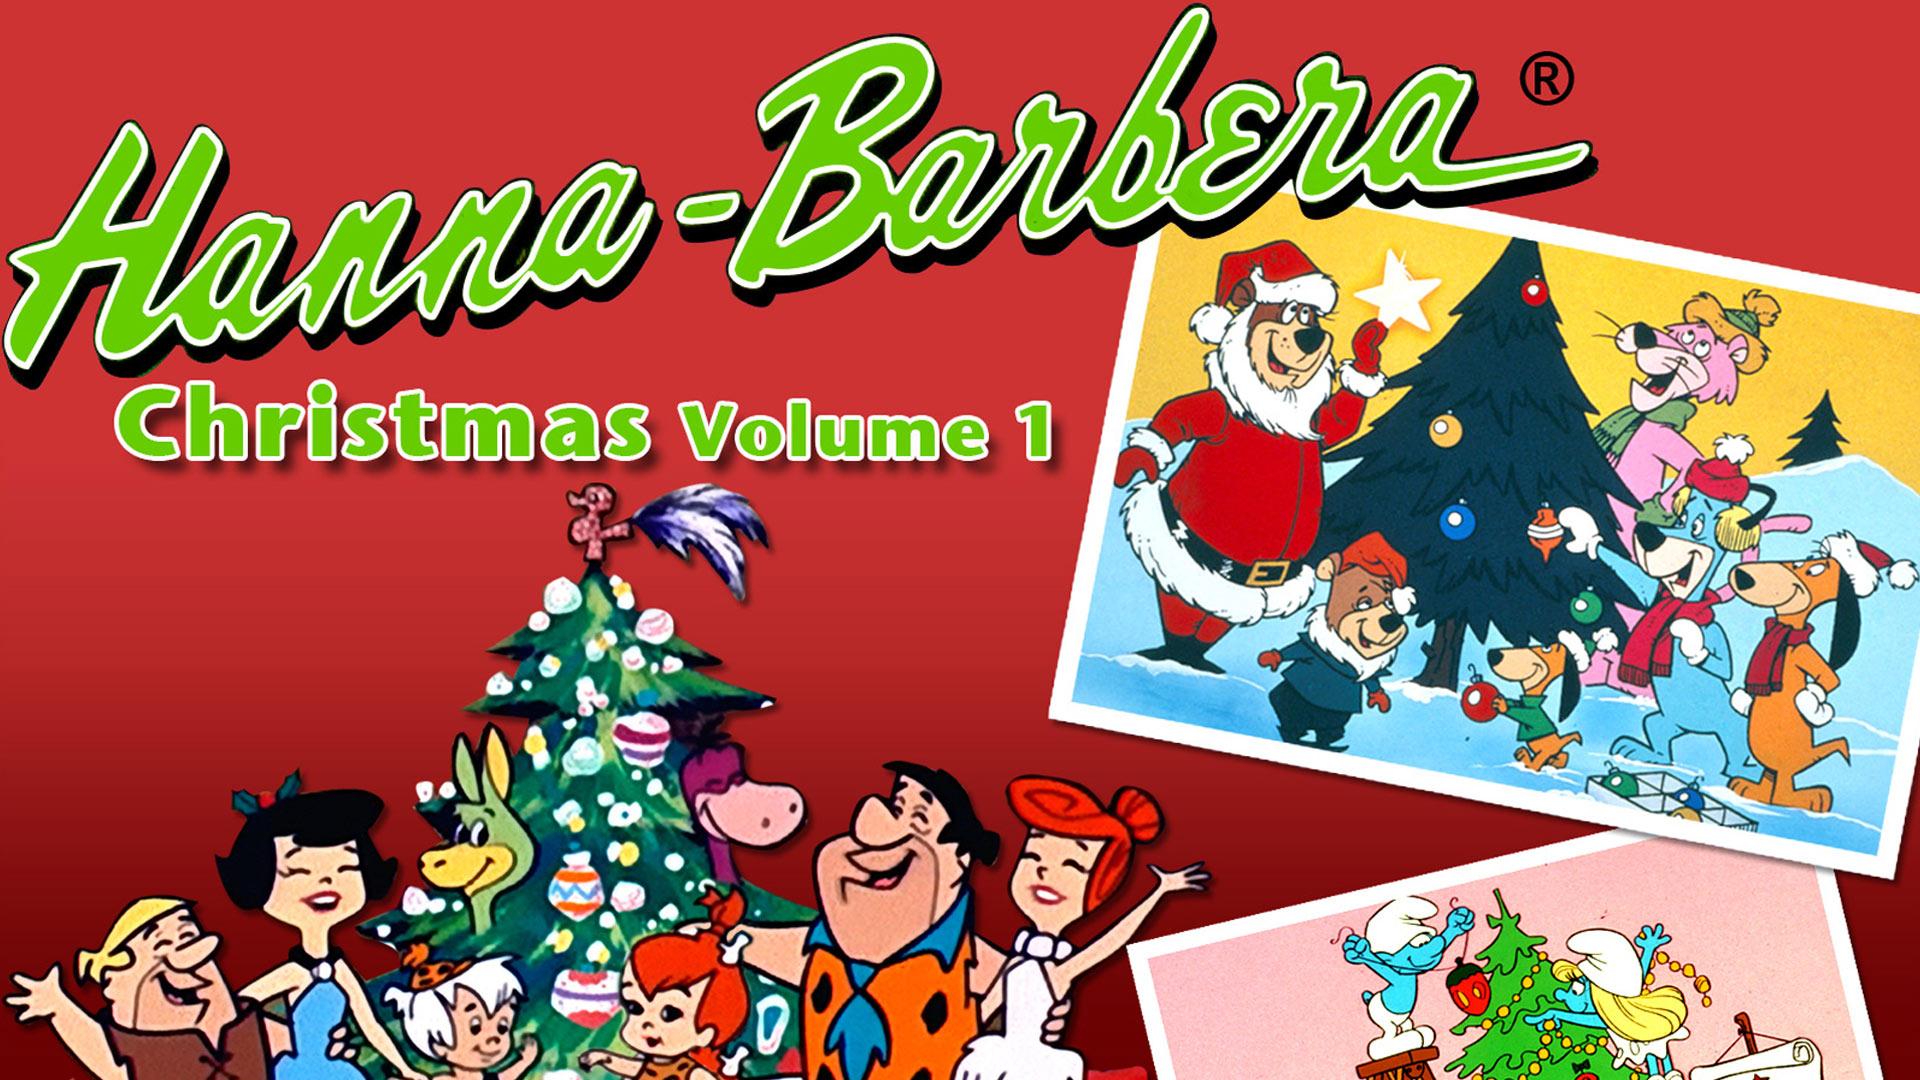 Hanna Barbera Christmas Volume 1